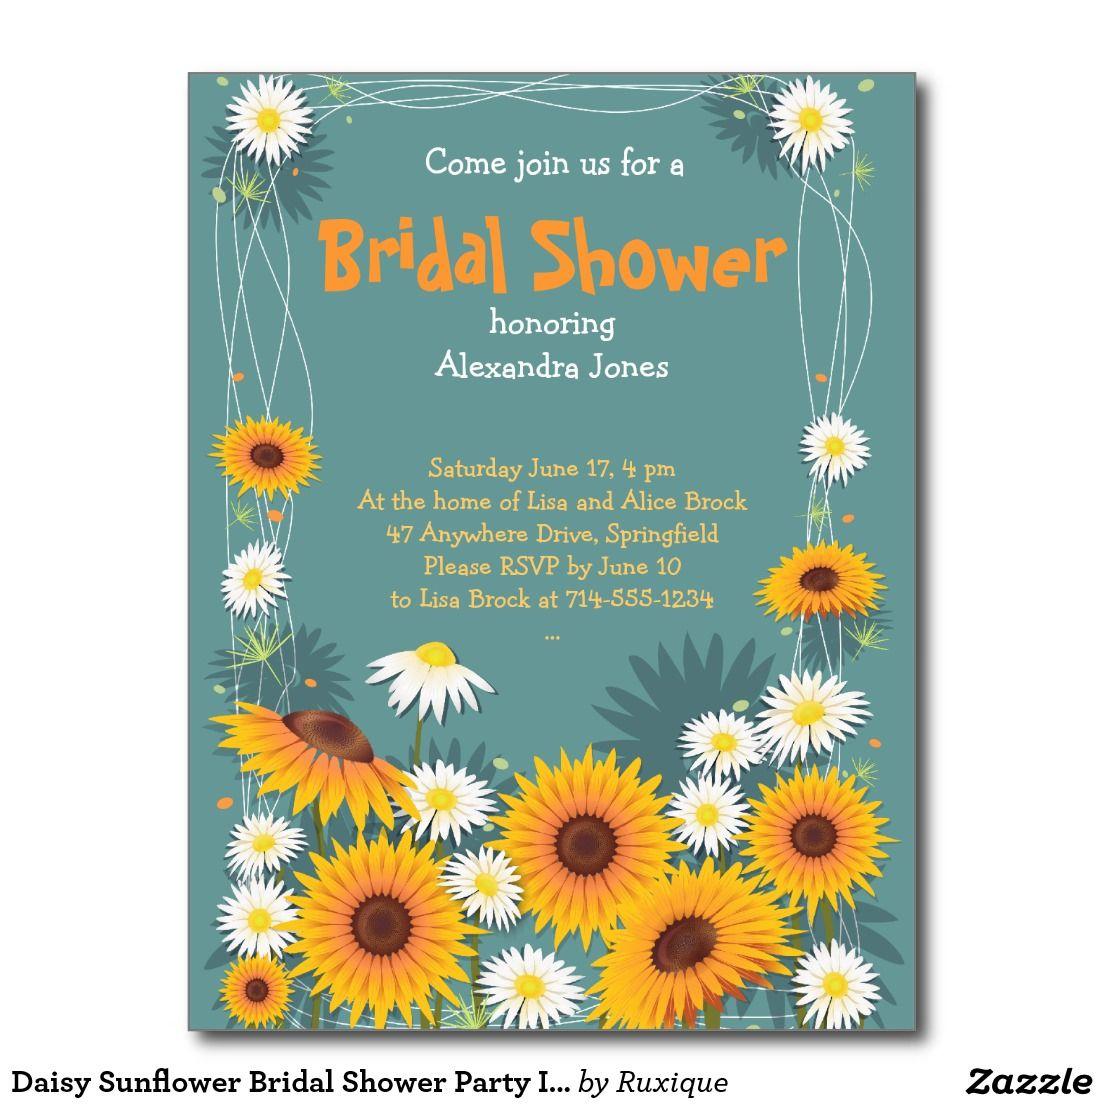 Daisy Sunflower Bridal Shower Party Invitation Postcard | Bridal ...